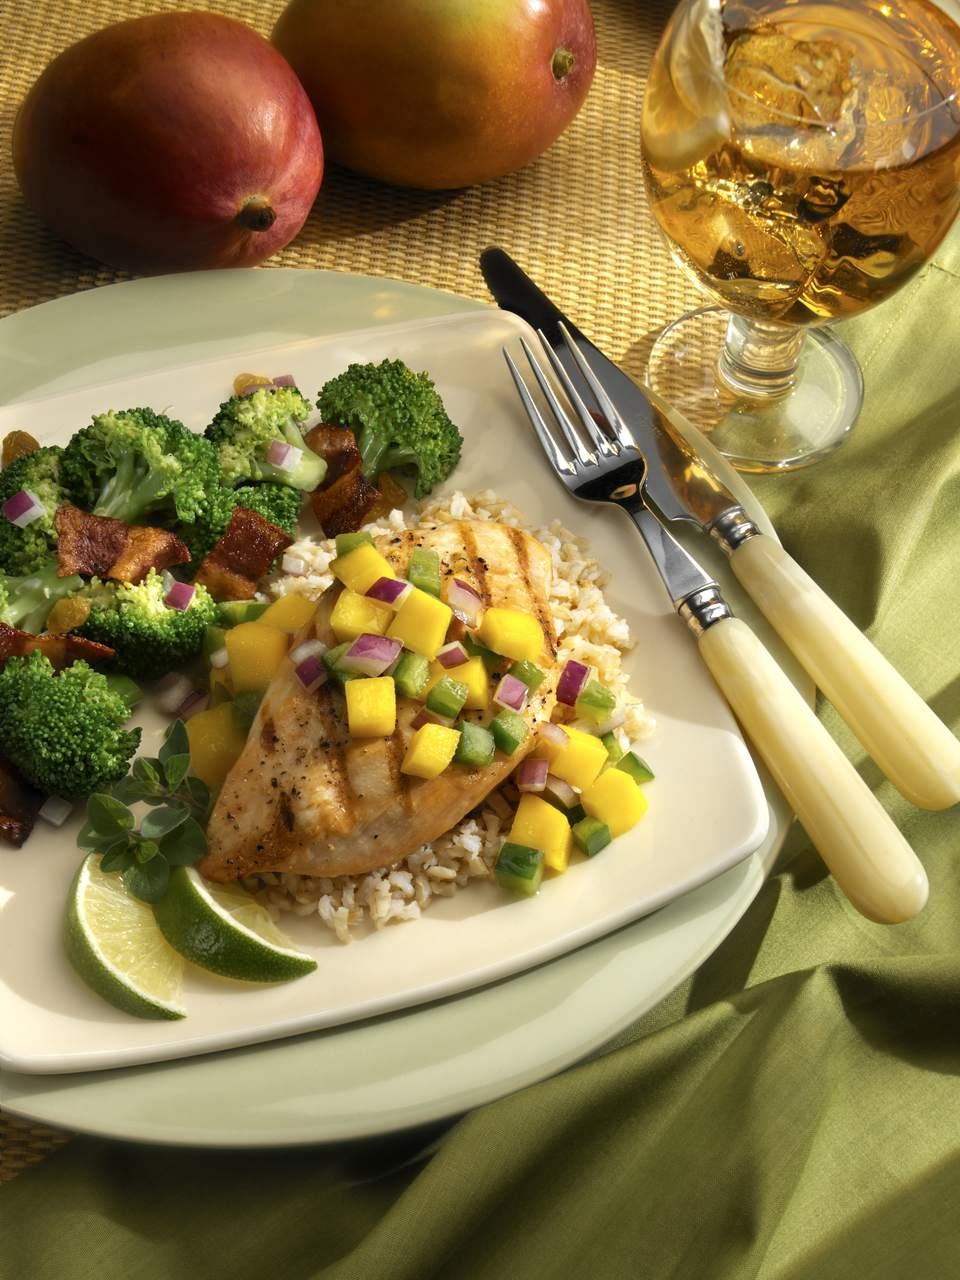 Grilled Chicken Breast with Mango Salsa